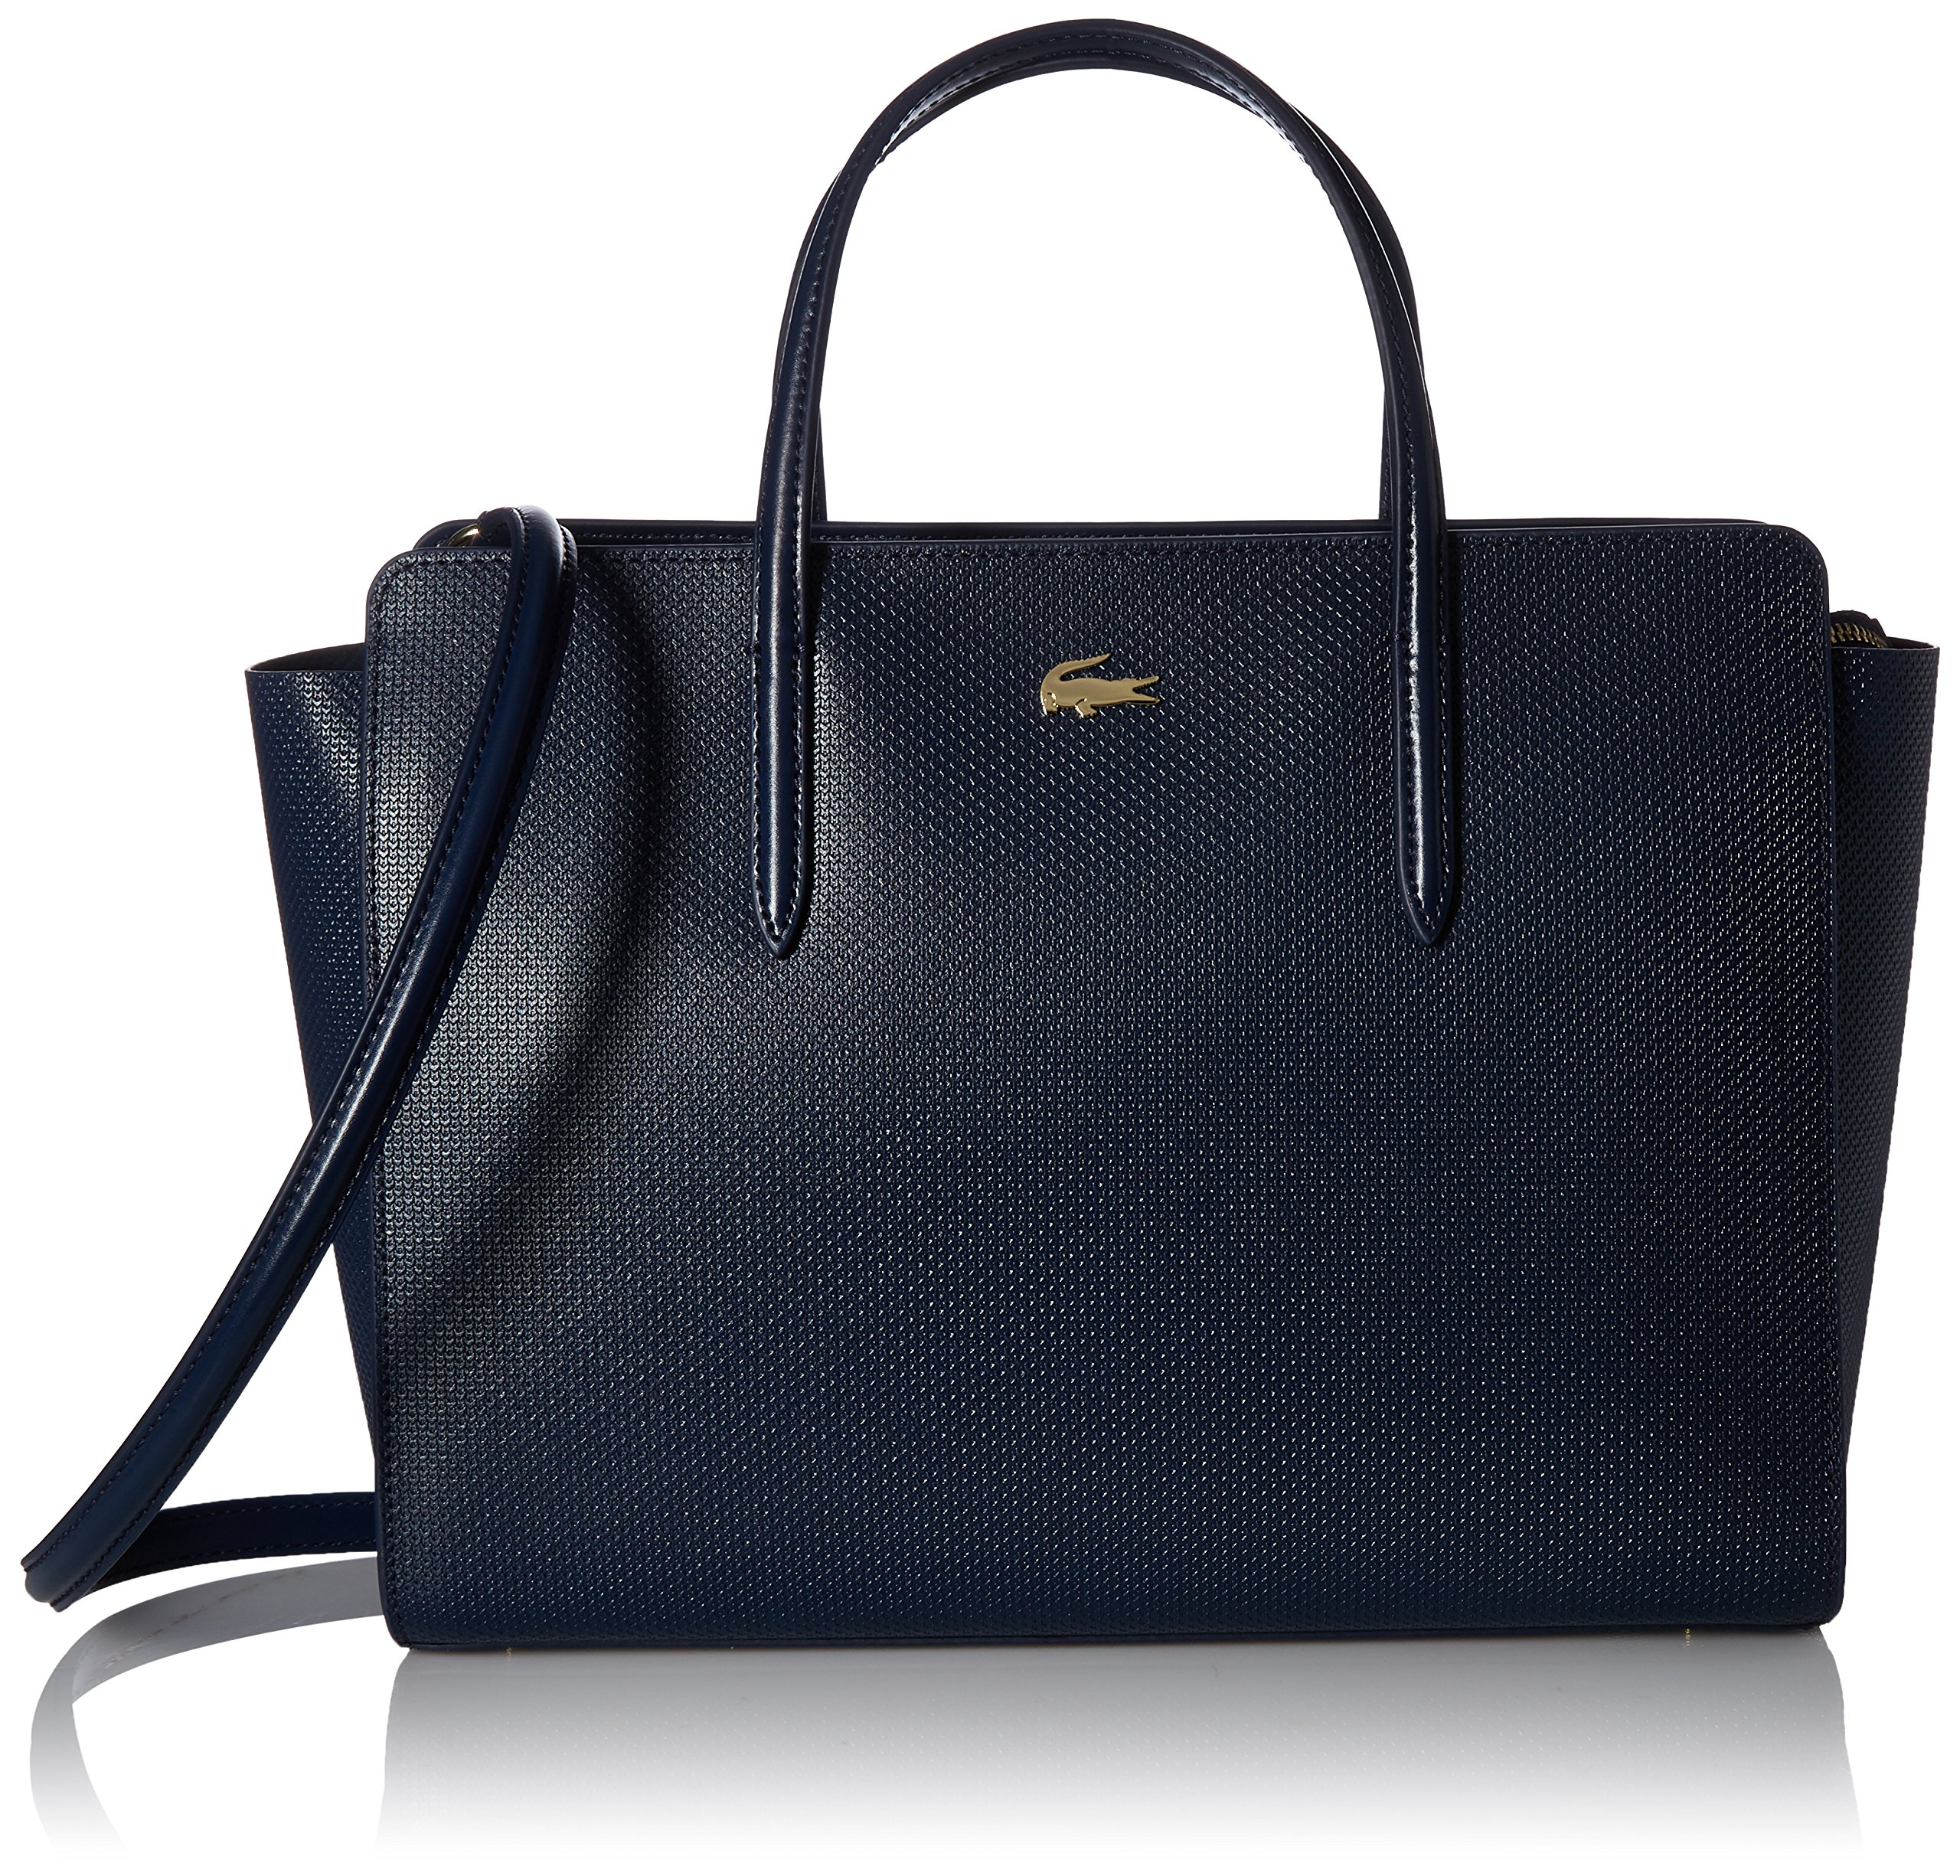 Lacoste Chantaco Shopping Bag, 021 Peacoat